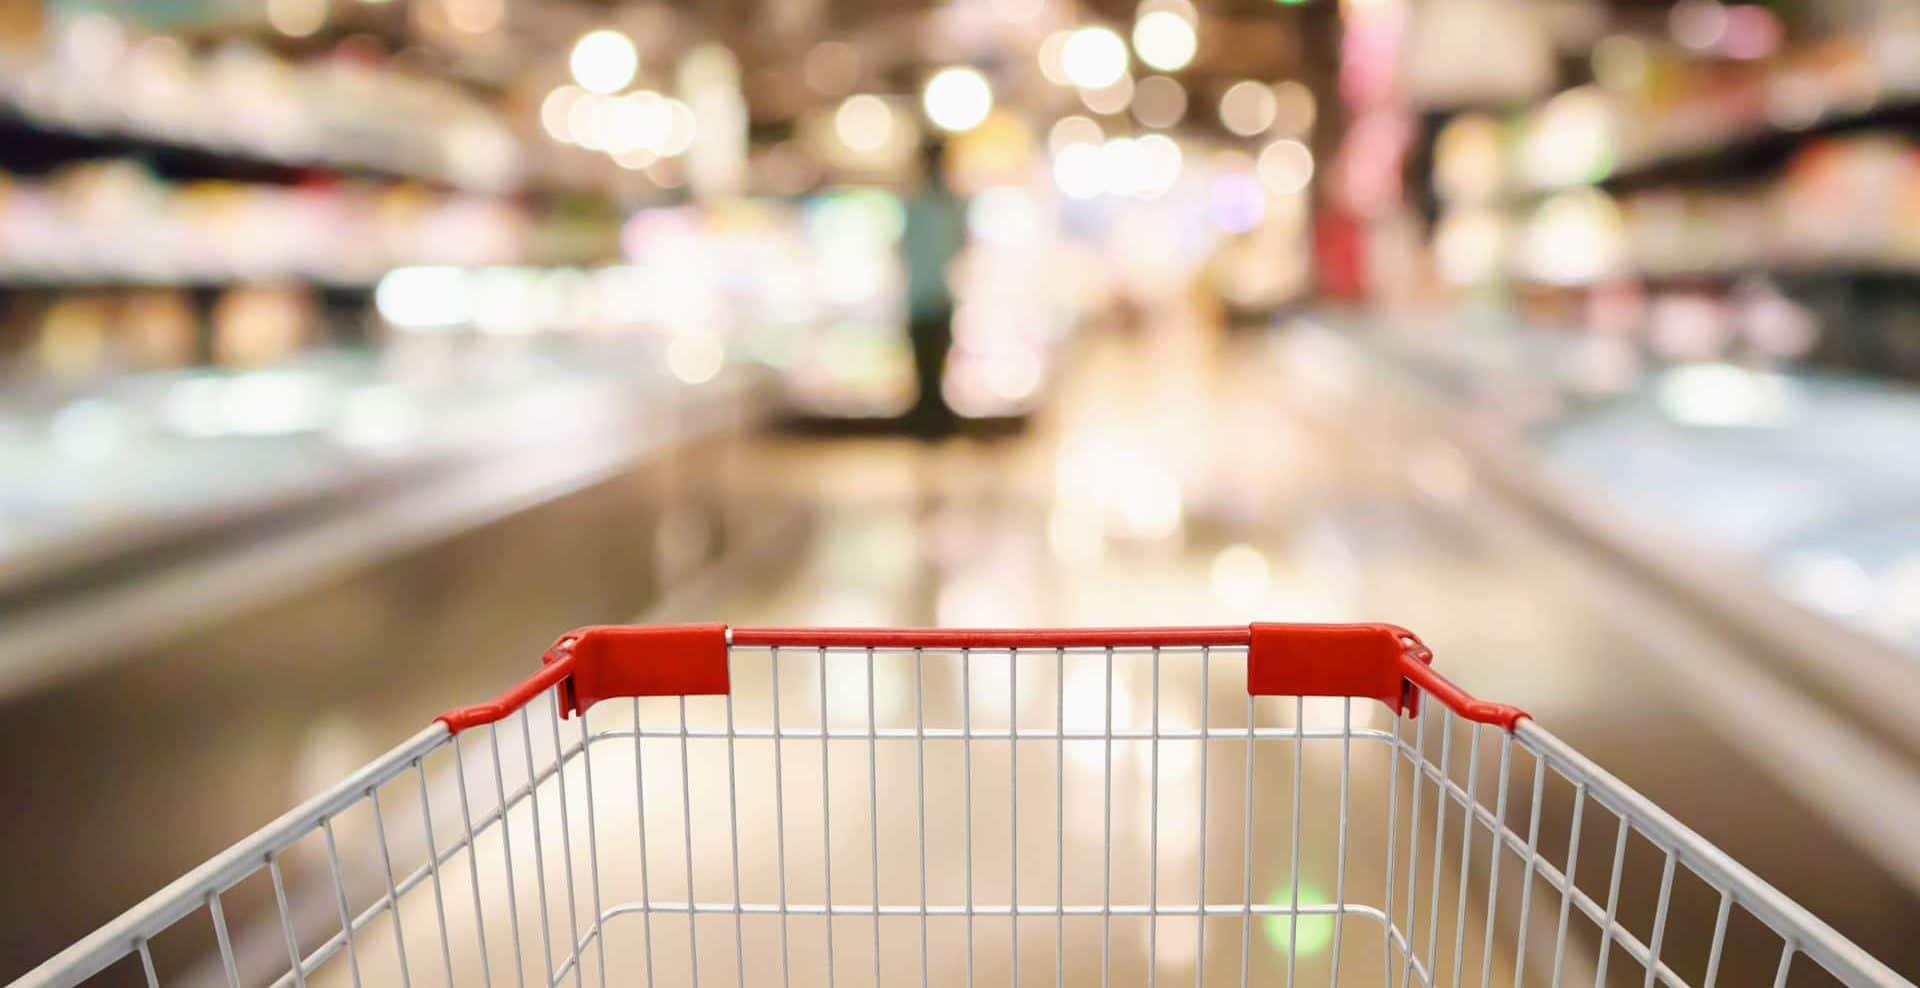 Case Study: Whole Foods Fridge Move